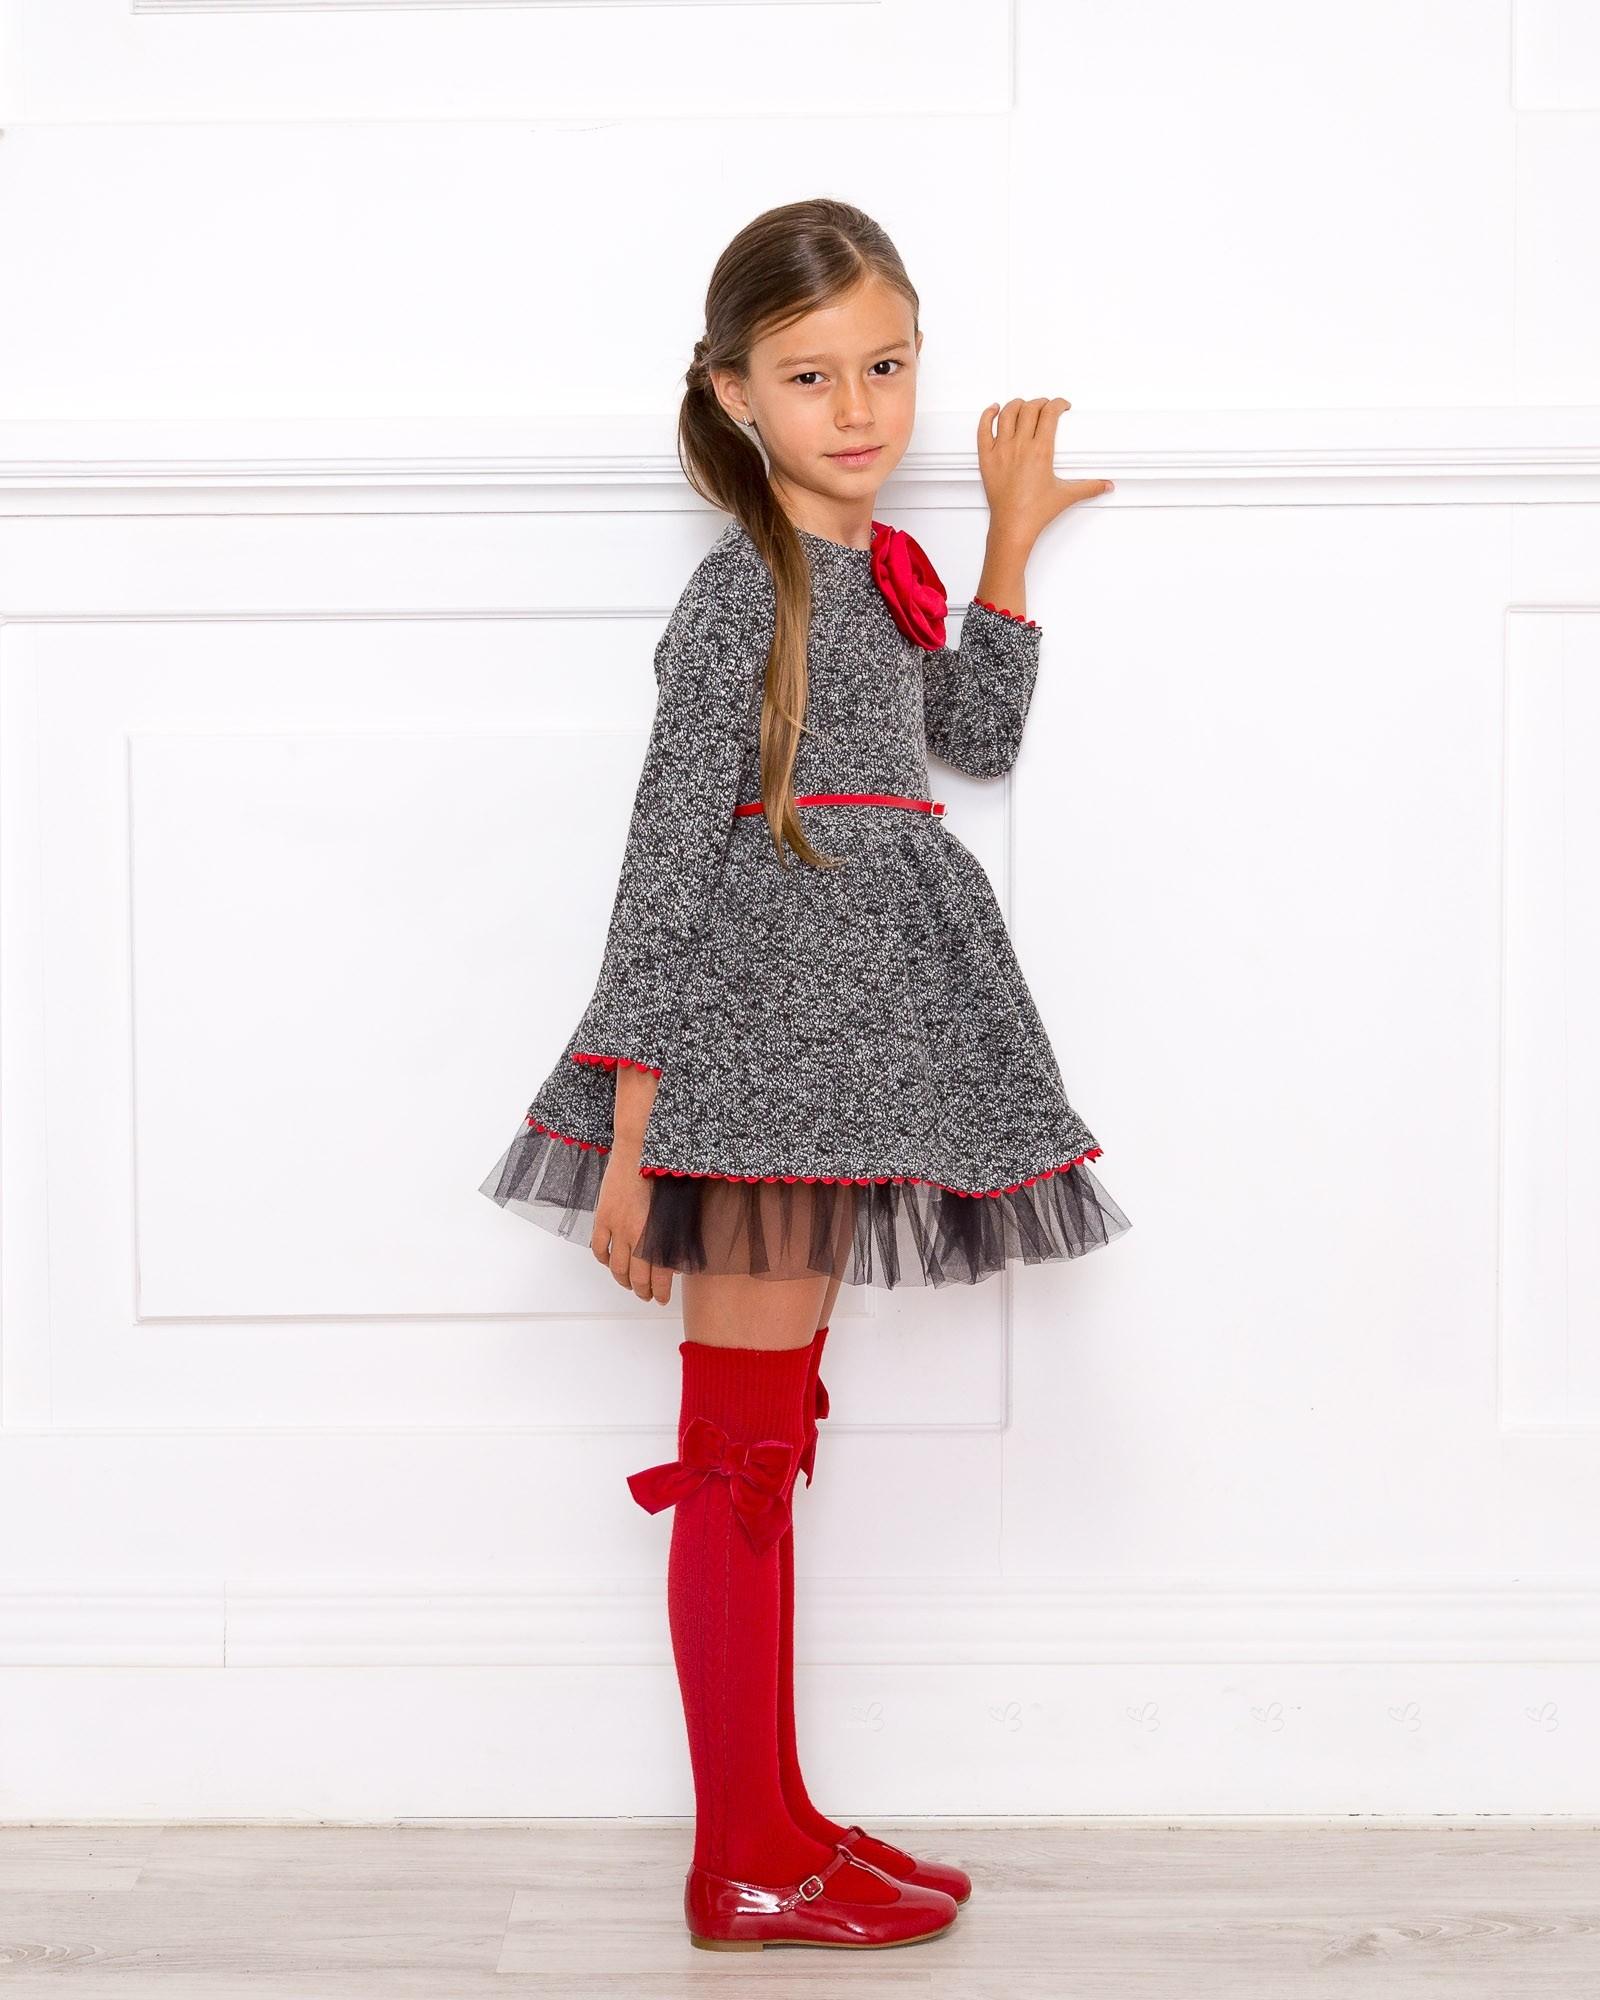 Nekenia Black White Knitted Dress With Red Flower Belt Missbaby